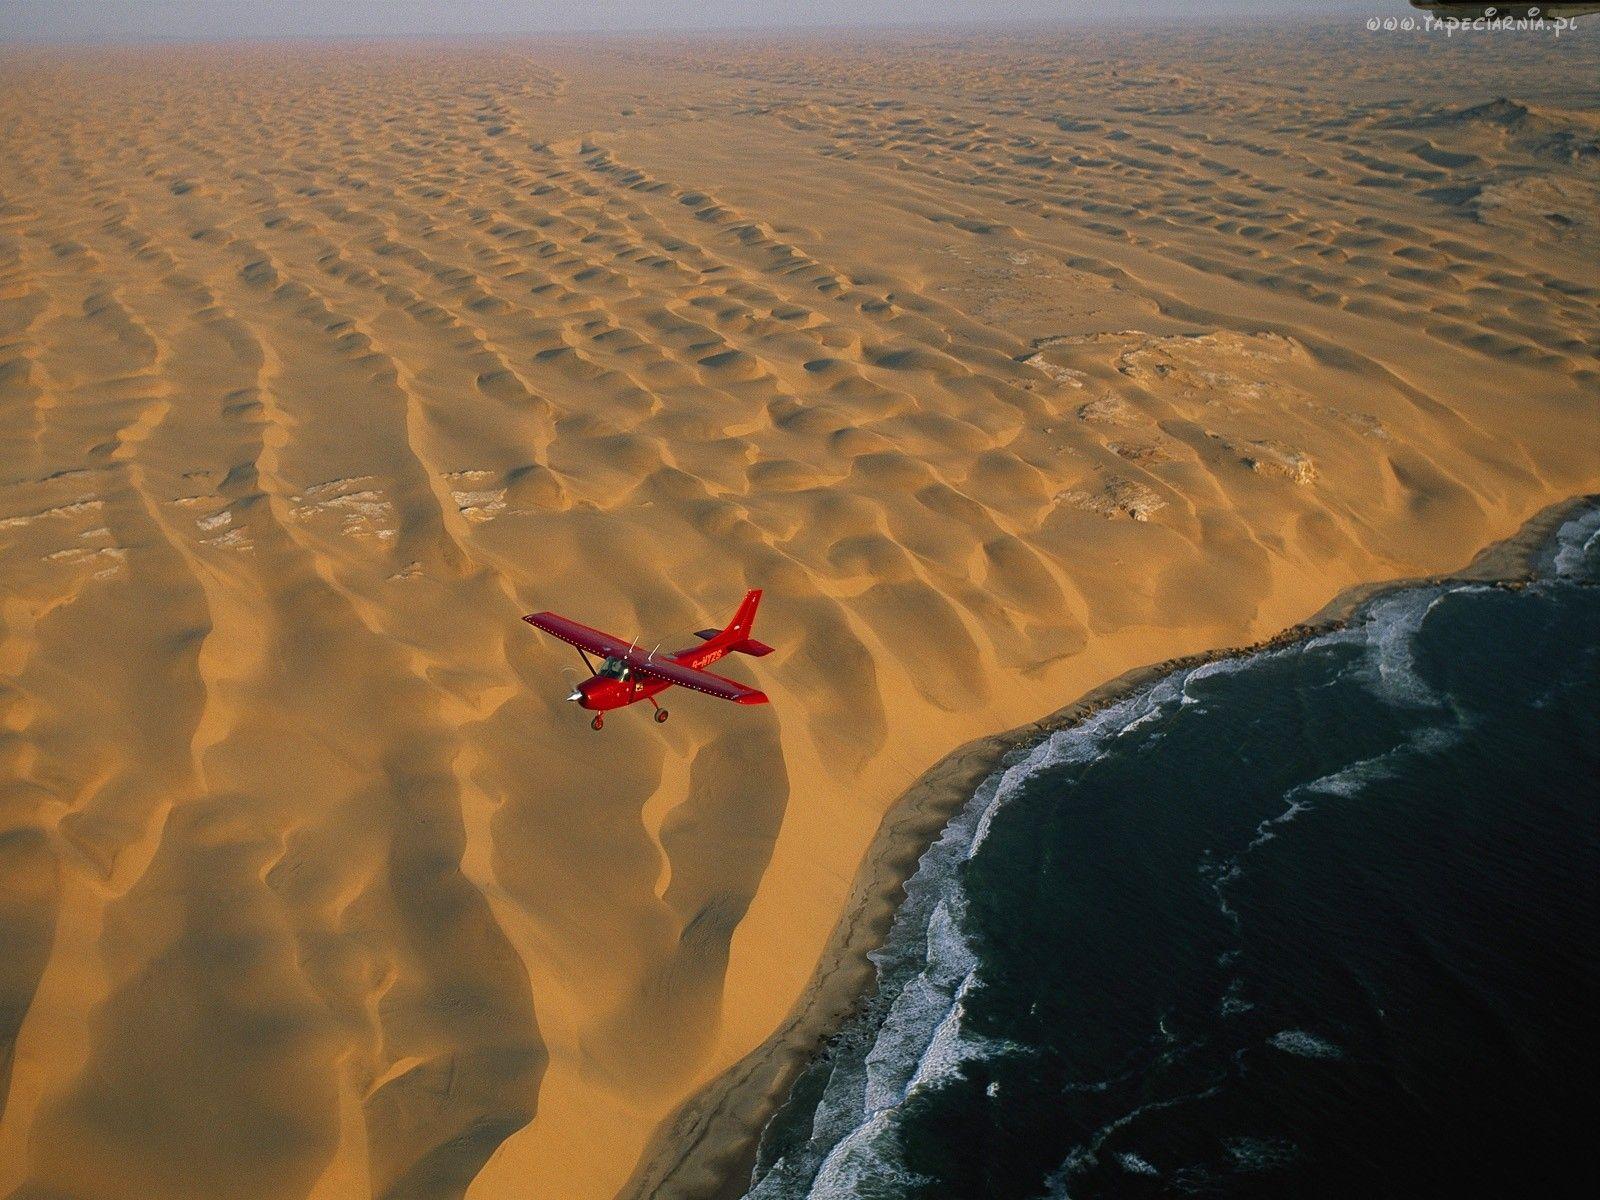 Morze, Pustynia, Samolot, Namibia